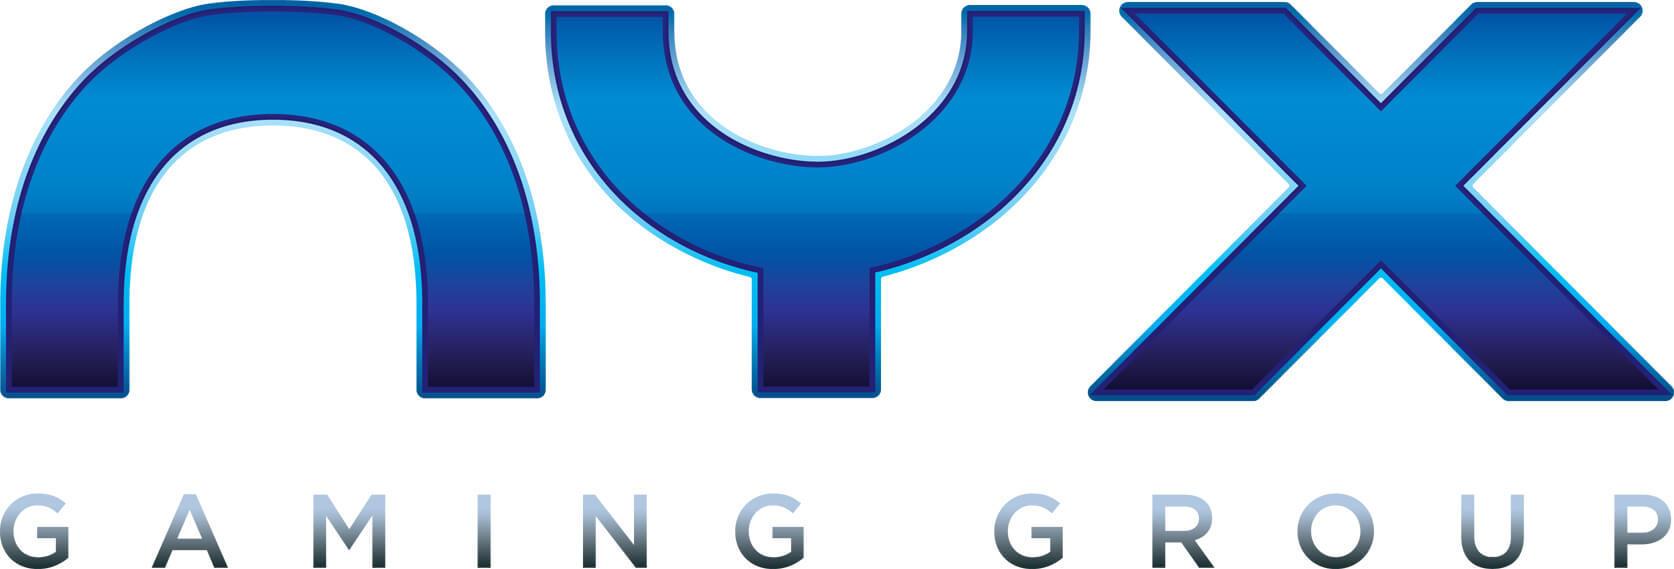 Výrobci NYX rostly prodeje o skoro 200% v 1. kvartálu!